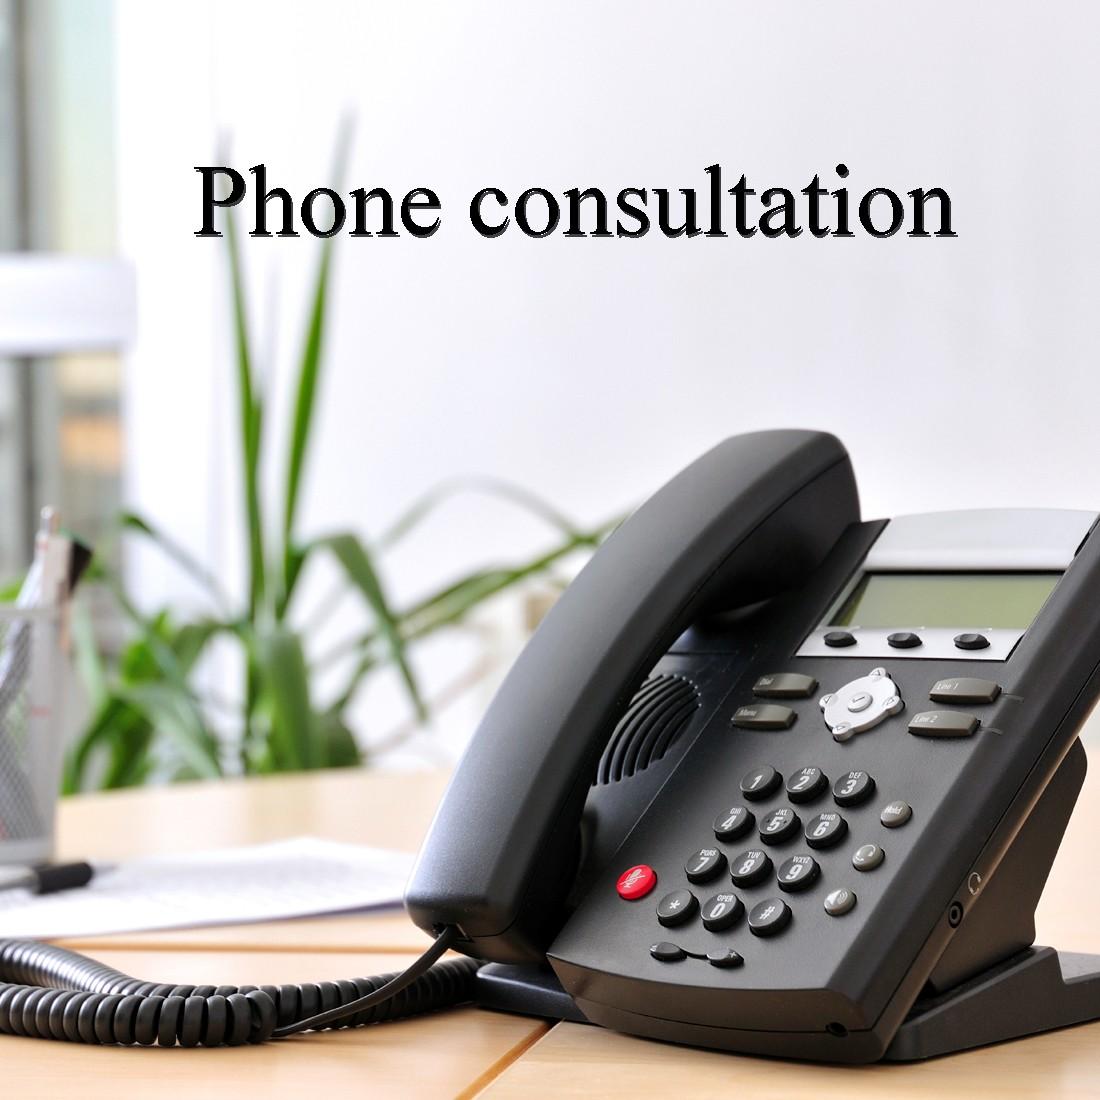 Telephone consultations in GP Practices |Telephone Consultation